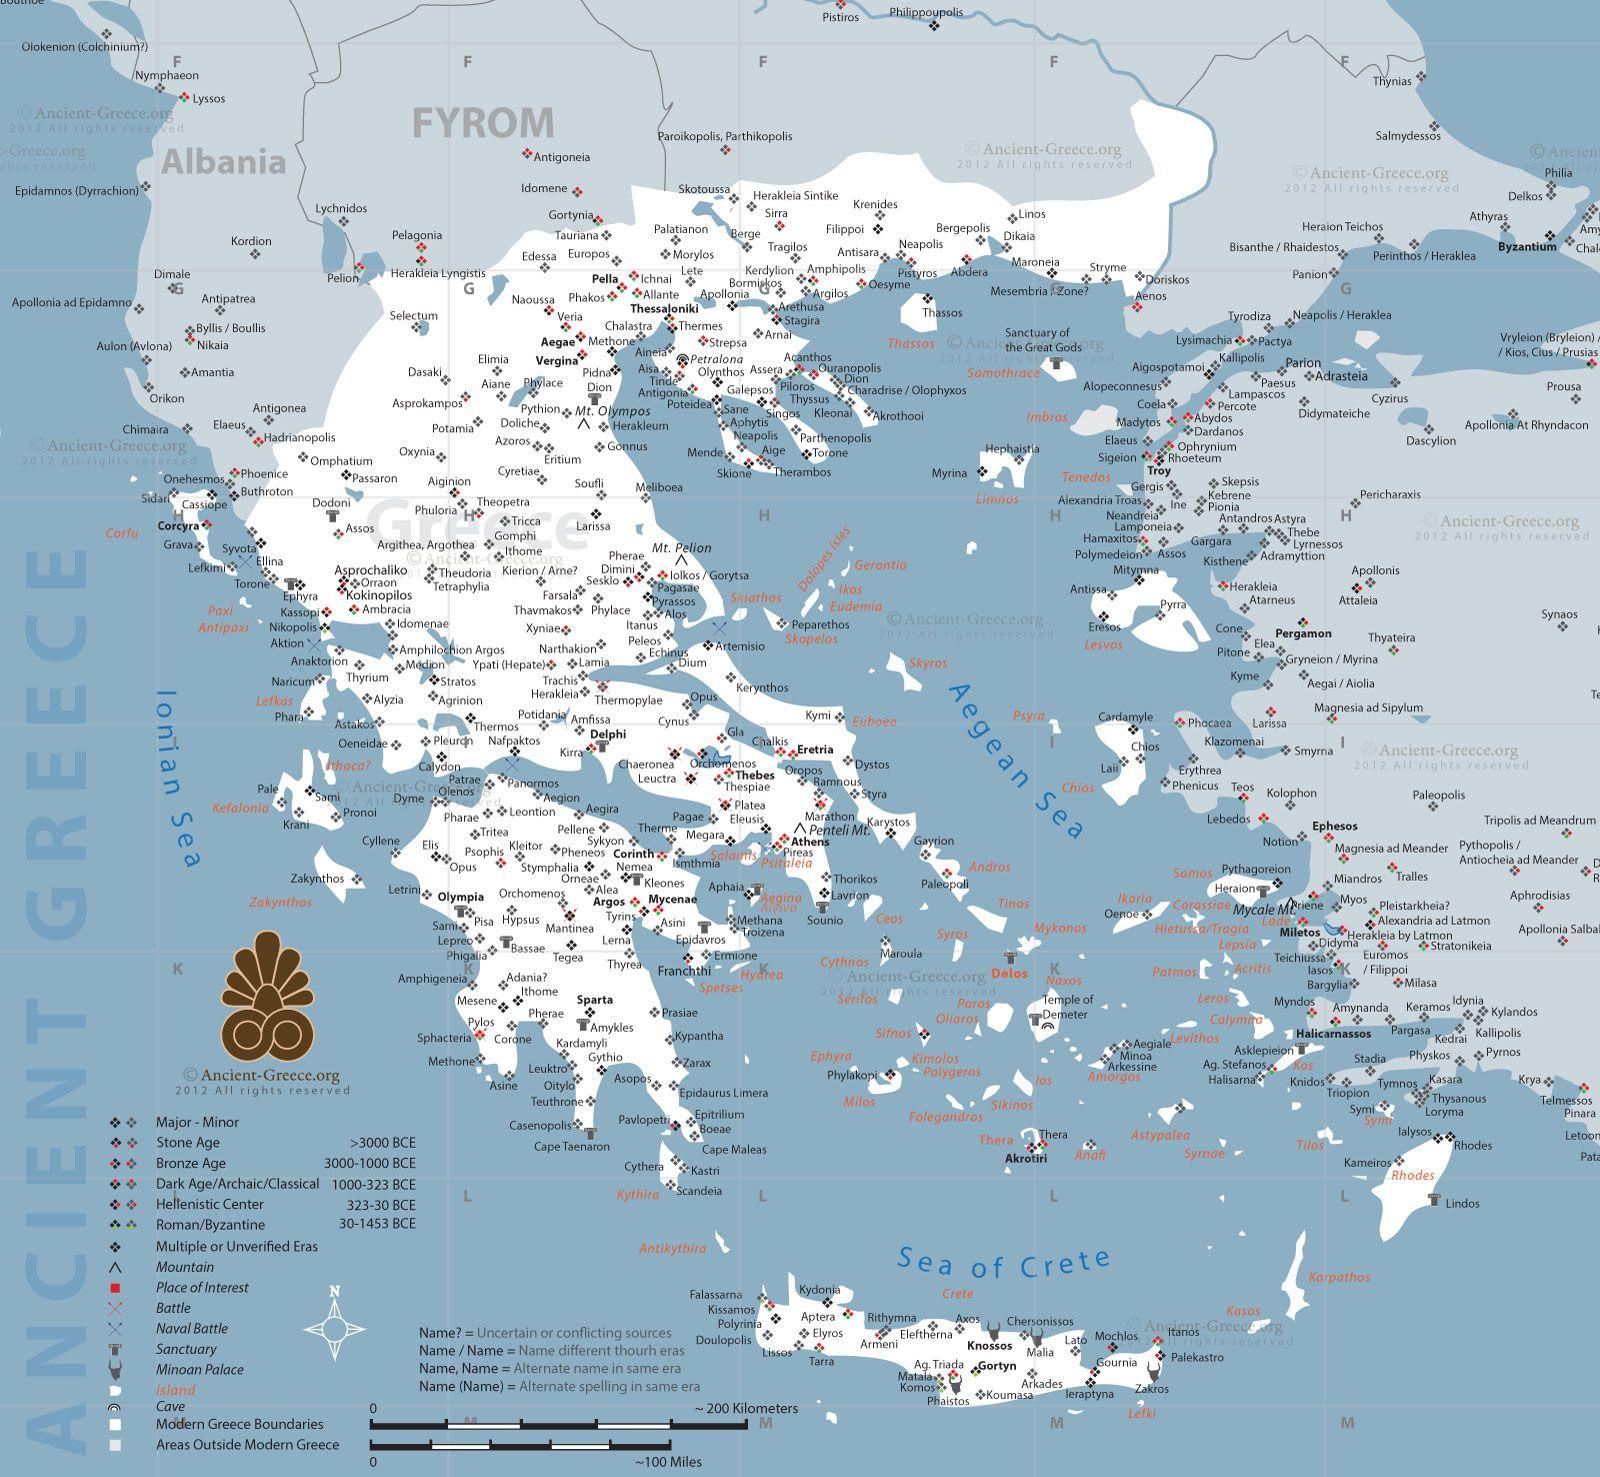 Ancient greece map greece pinterest ancient greece ancient greece map gumiabroncs Gallery